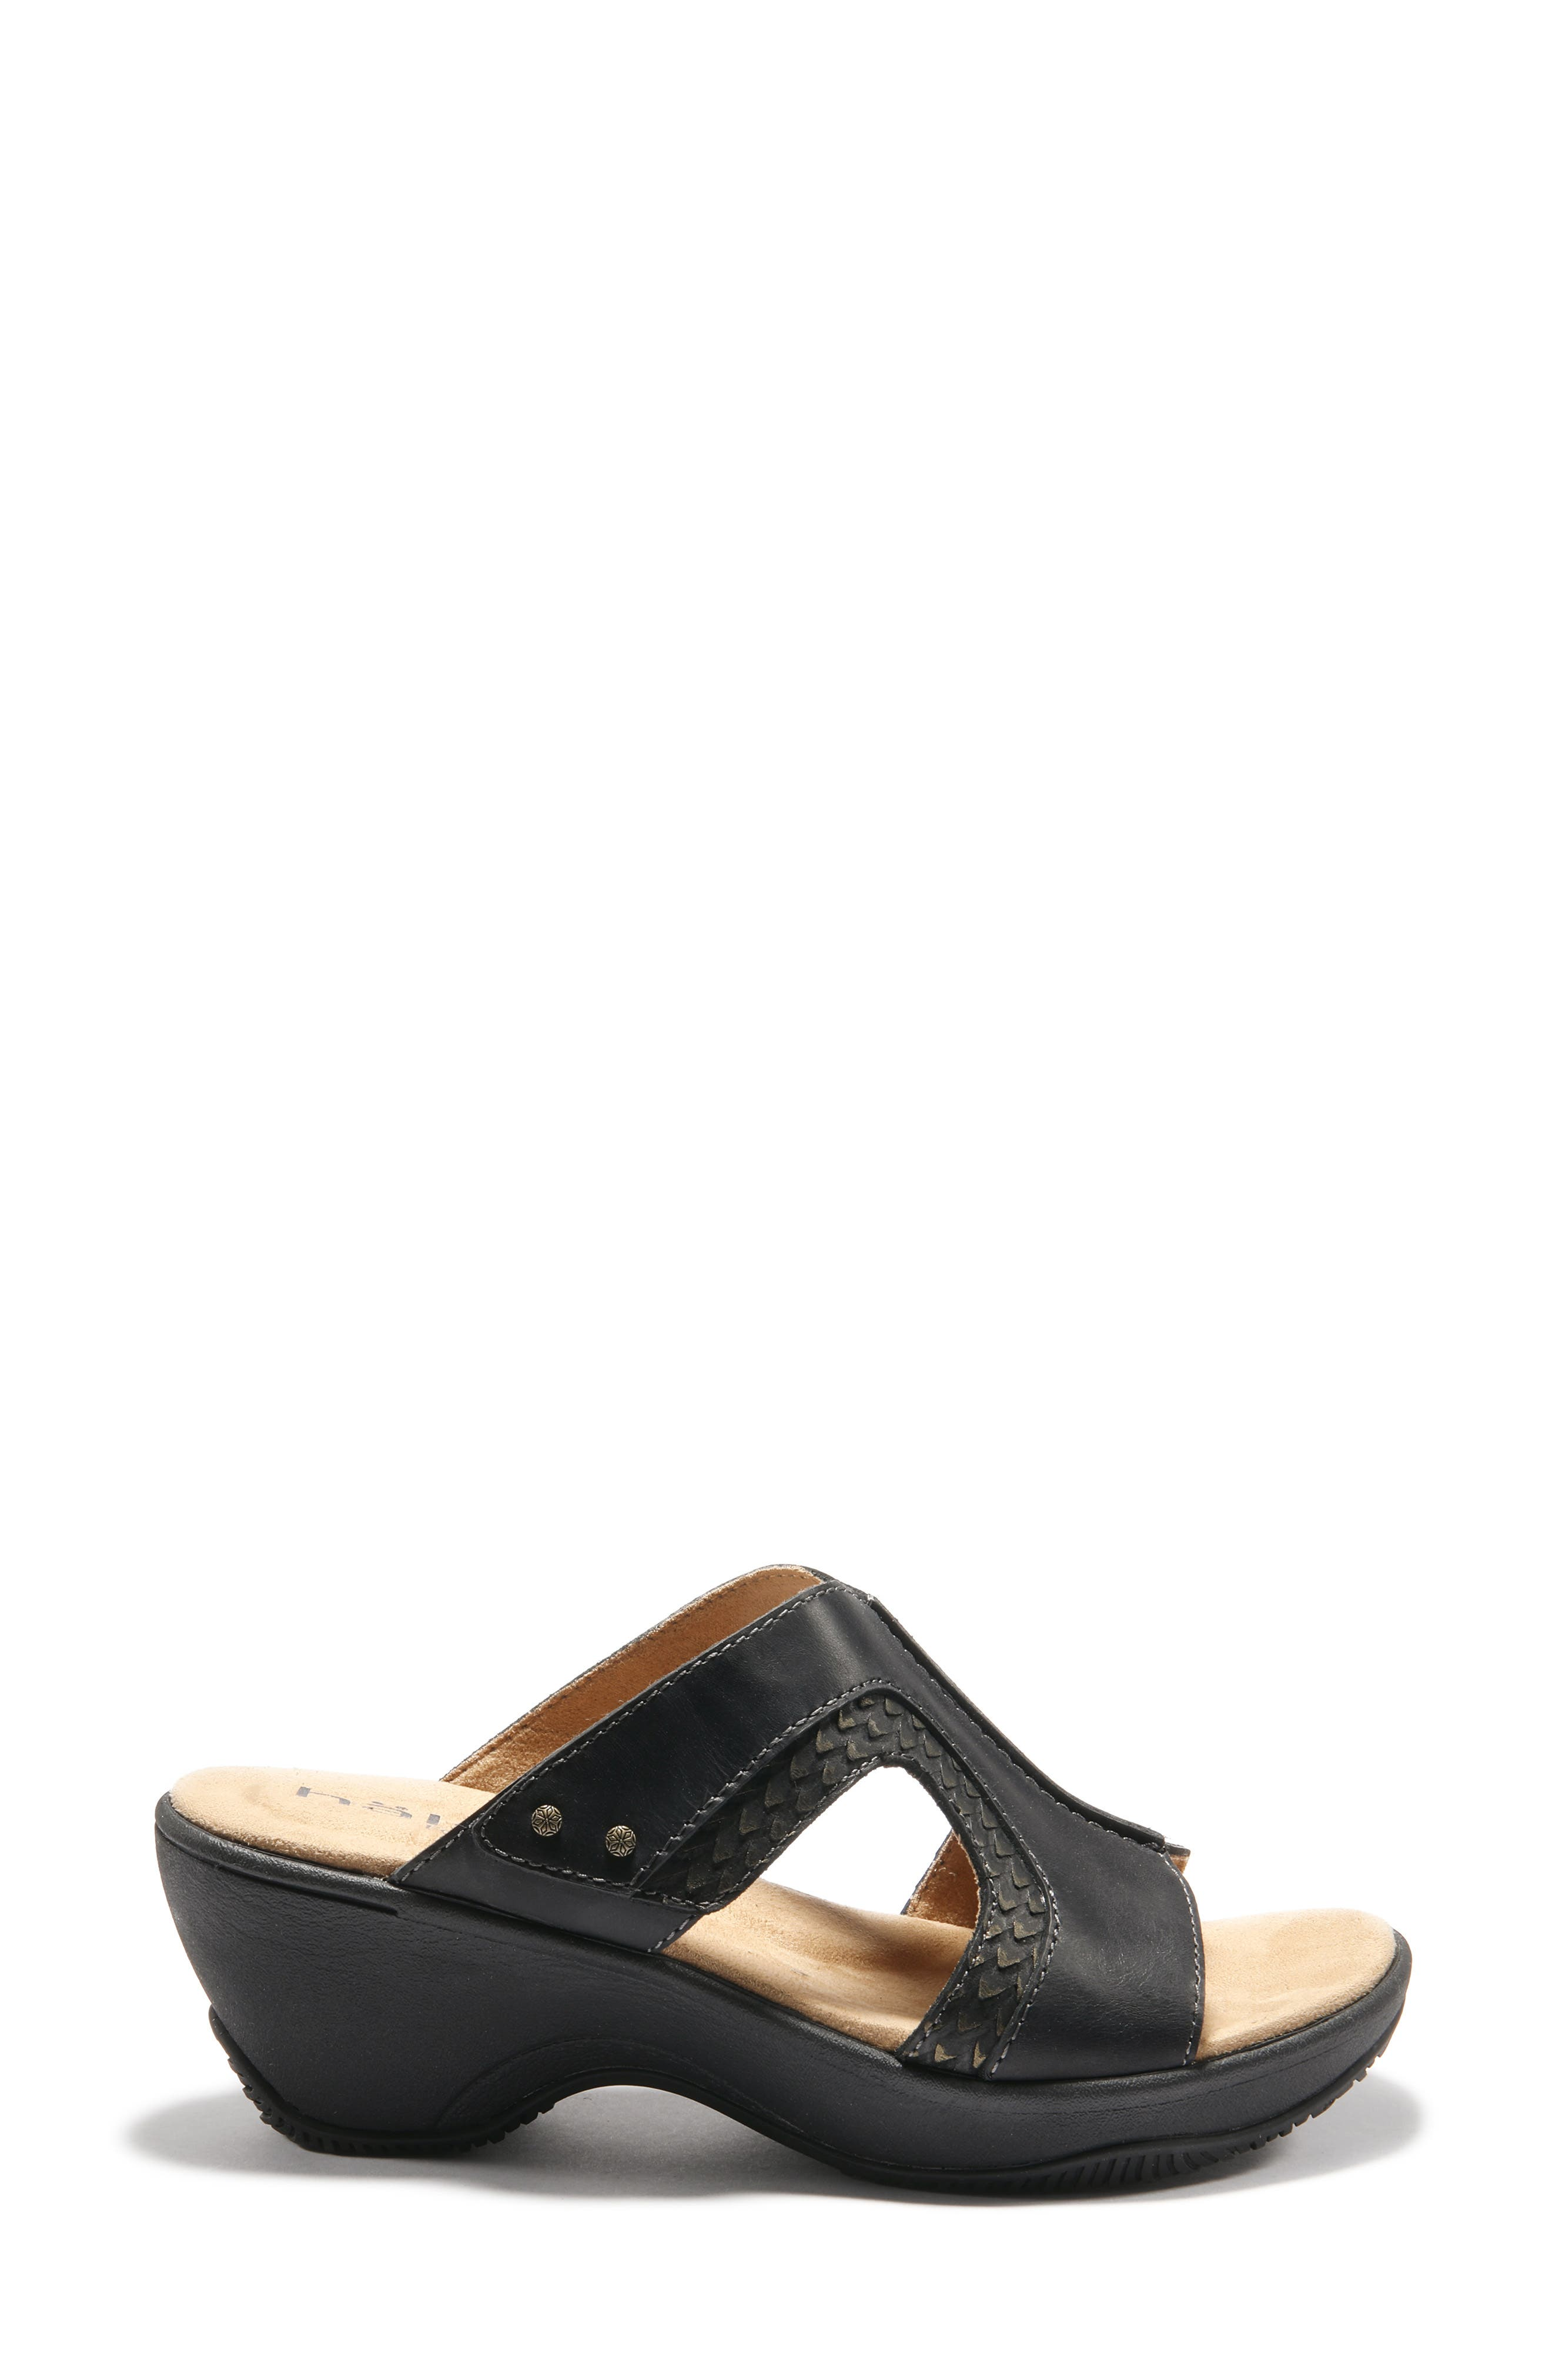 Women's Halsa Footwear Cassandra Wedge Slide Sandal